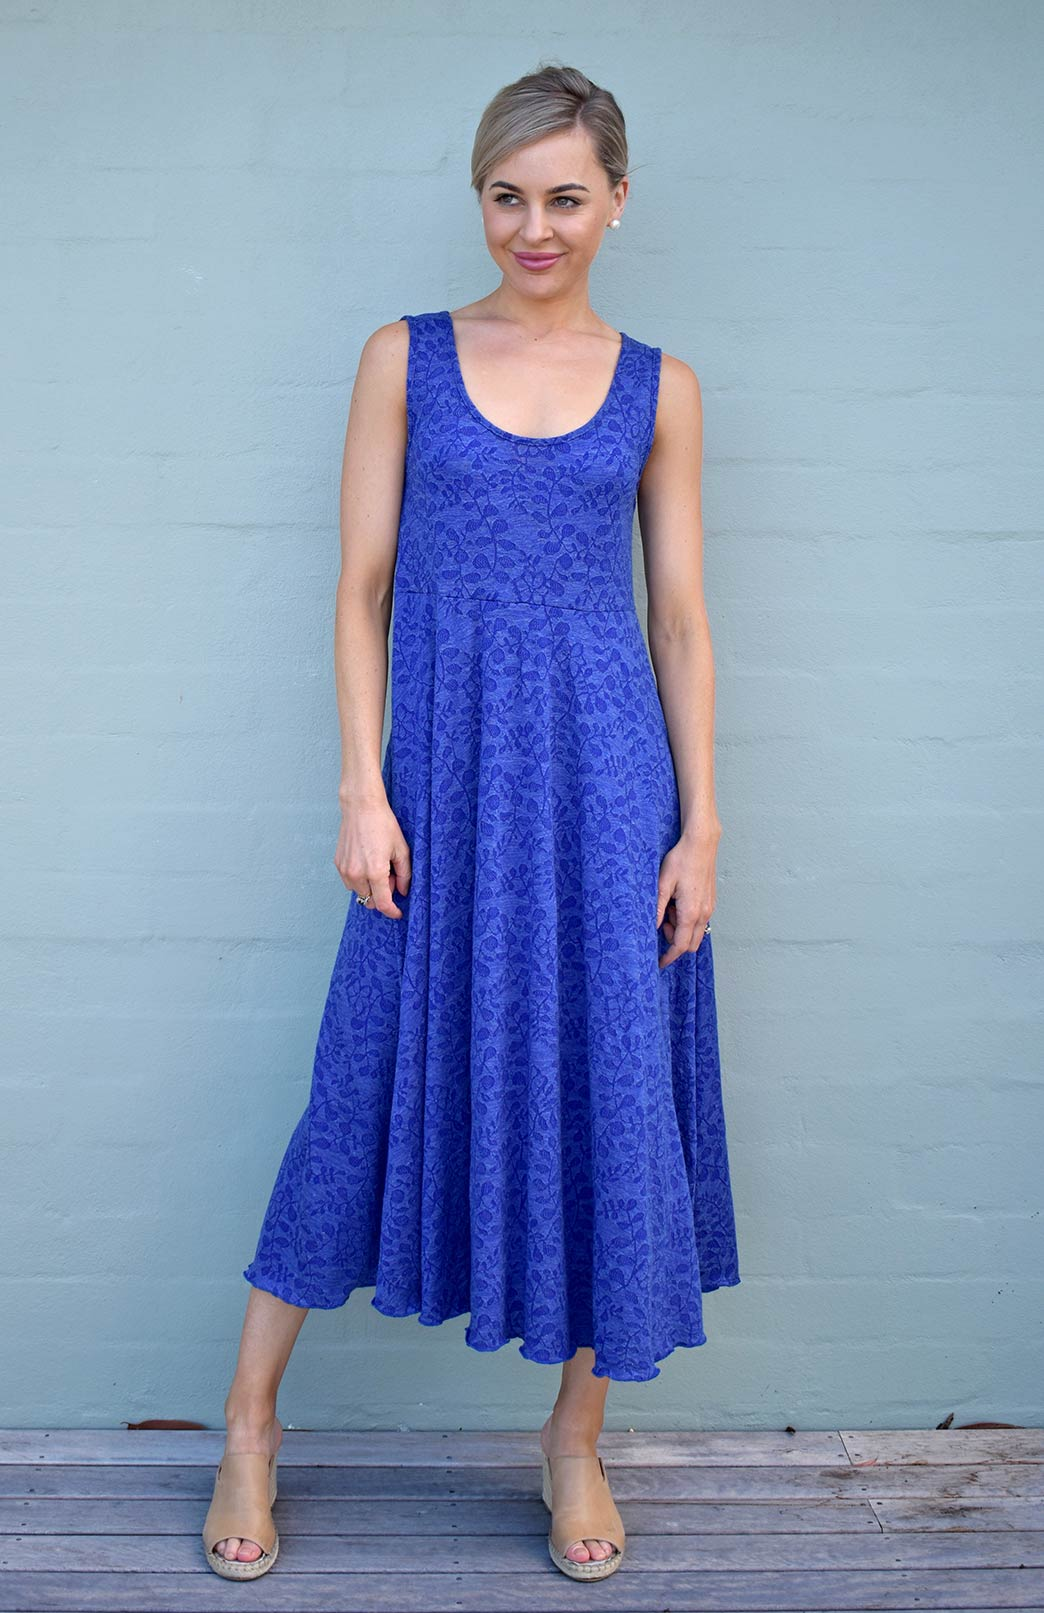 Fan Dress - Women's Merino Wool Royal Blue Floral Fan Dress with Empire Waistline and Flared Skirt - Smitten Merino Tasmania Australia